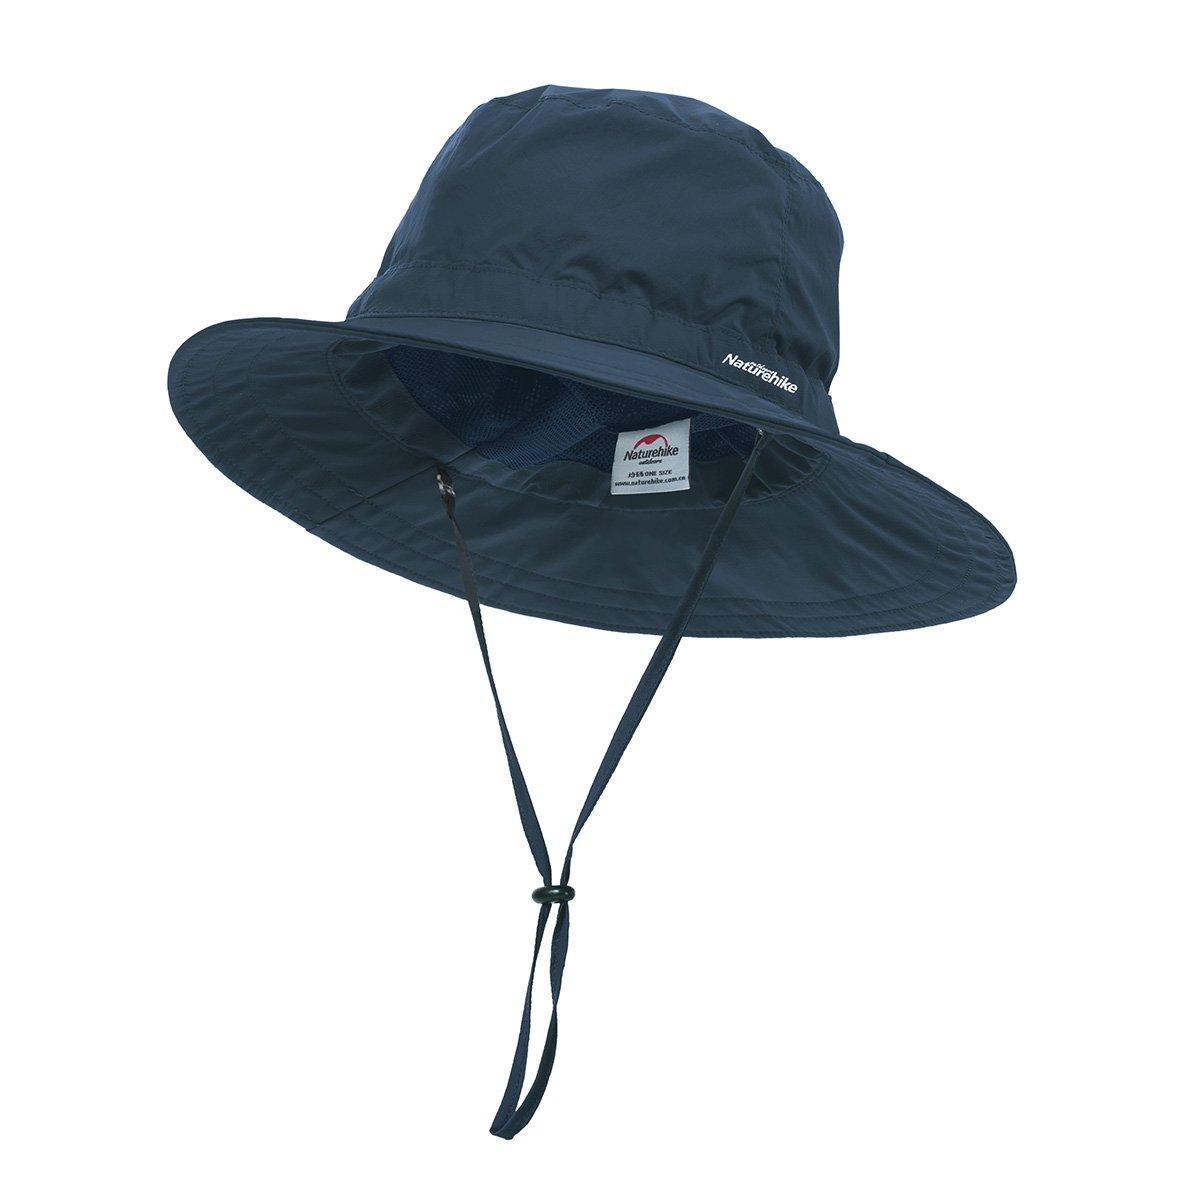 TRIWONDER Fishing Hunting Bucket Hat Waterproof Boonie Hat Sun Cap for Men Women